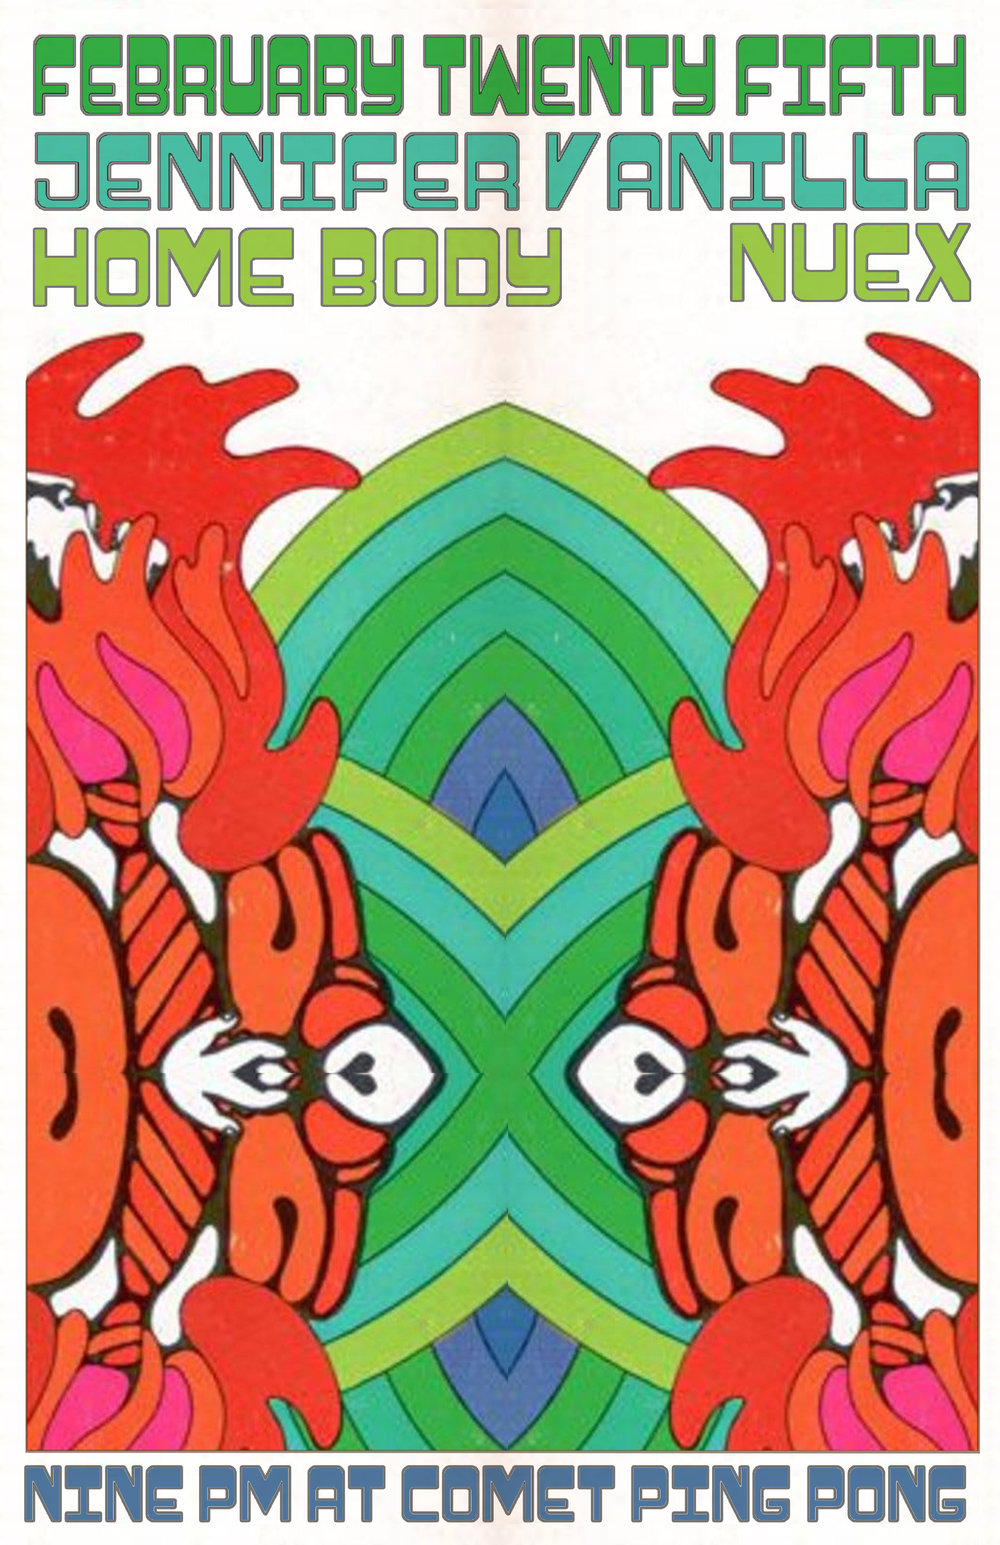 jennifer vanilla home body nuex poster.jpg